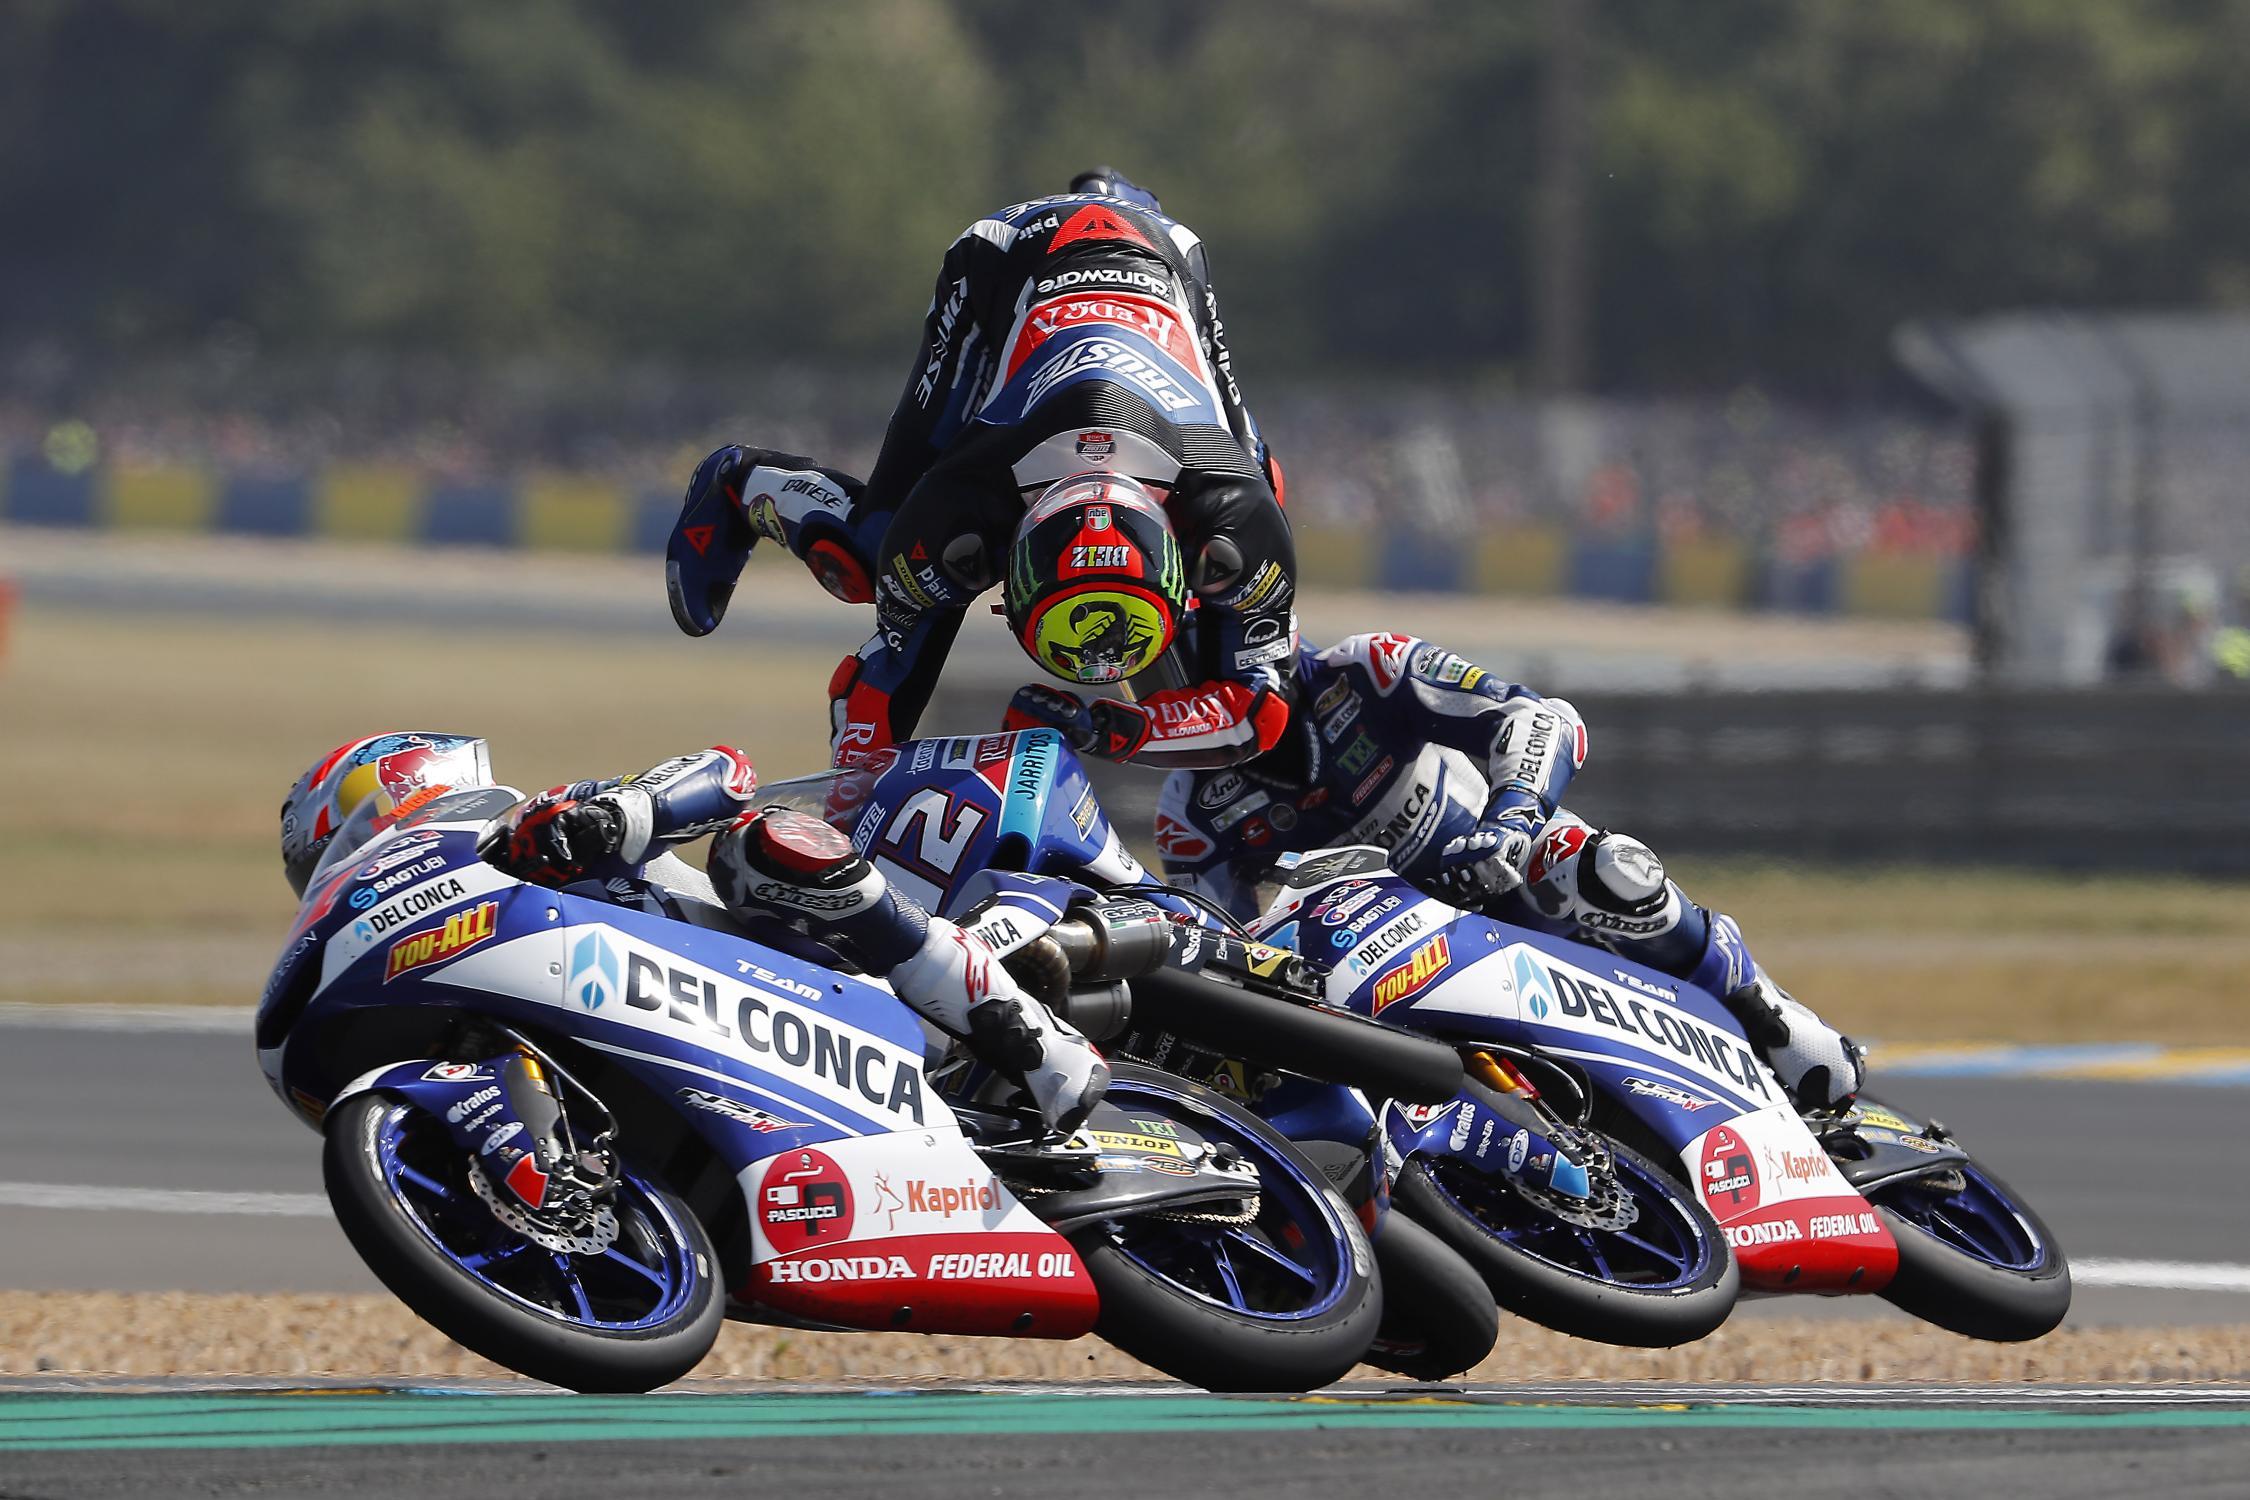 [GP] Le Mans 05lemans18m3-jolivares_joc7269.gallery_full_top_fullscreen